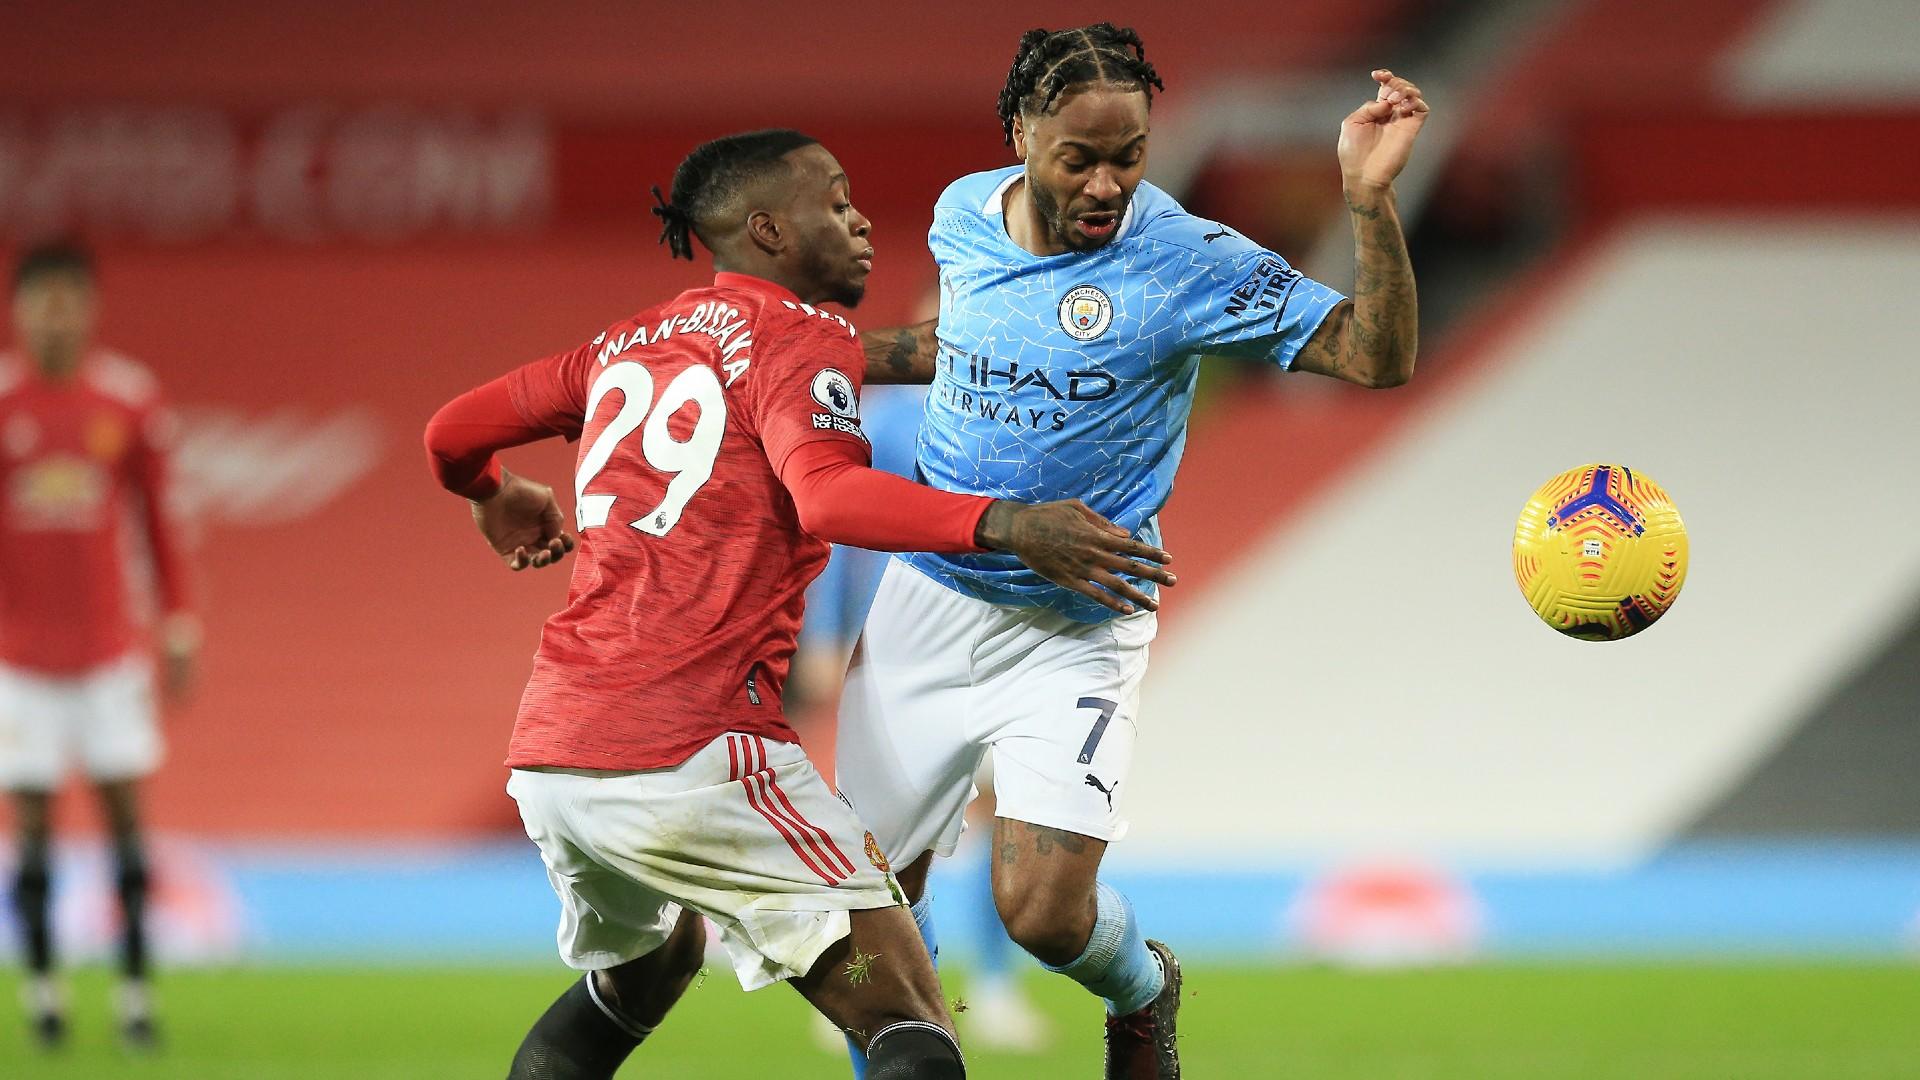 United v City again in EFL Cup semis as Spurs get Brentford